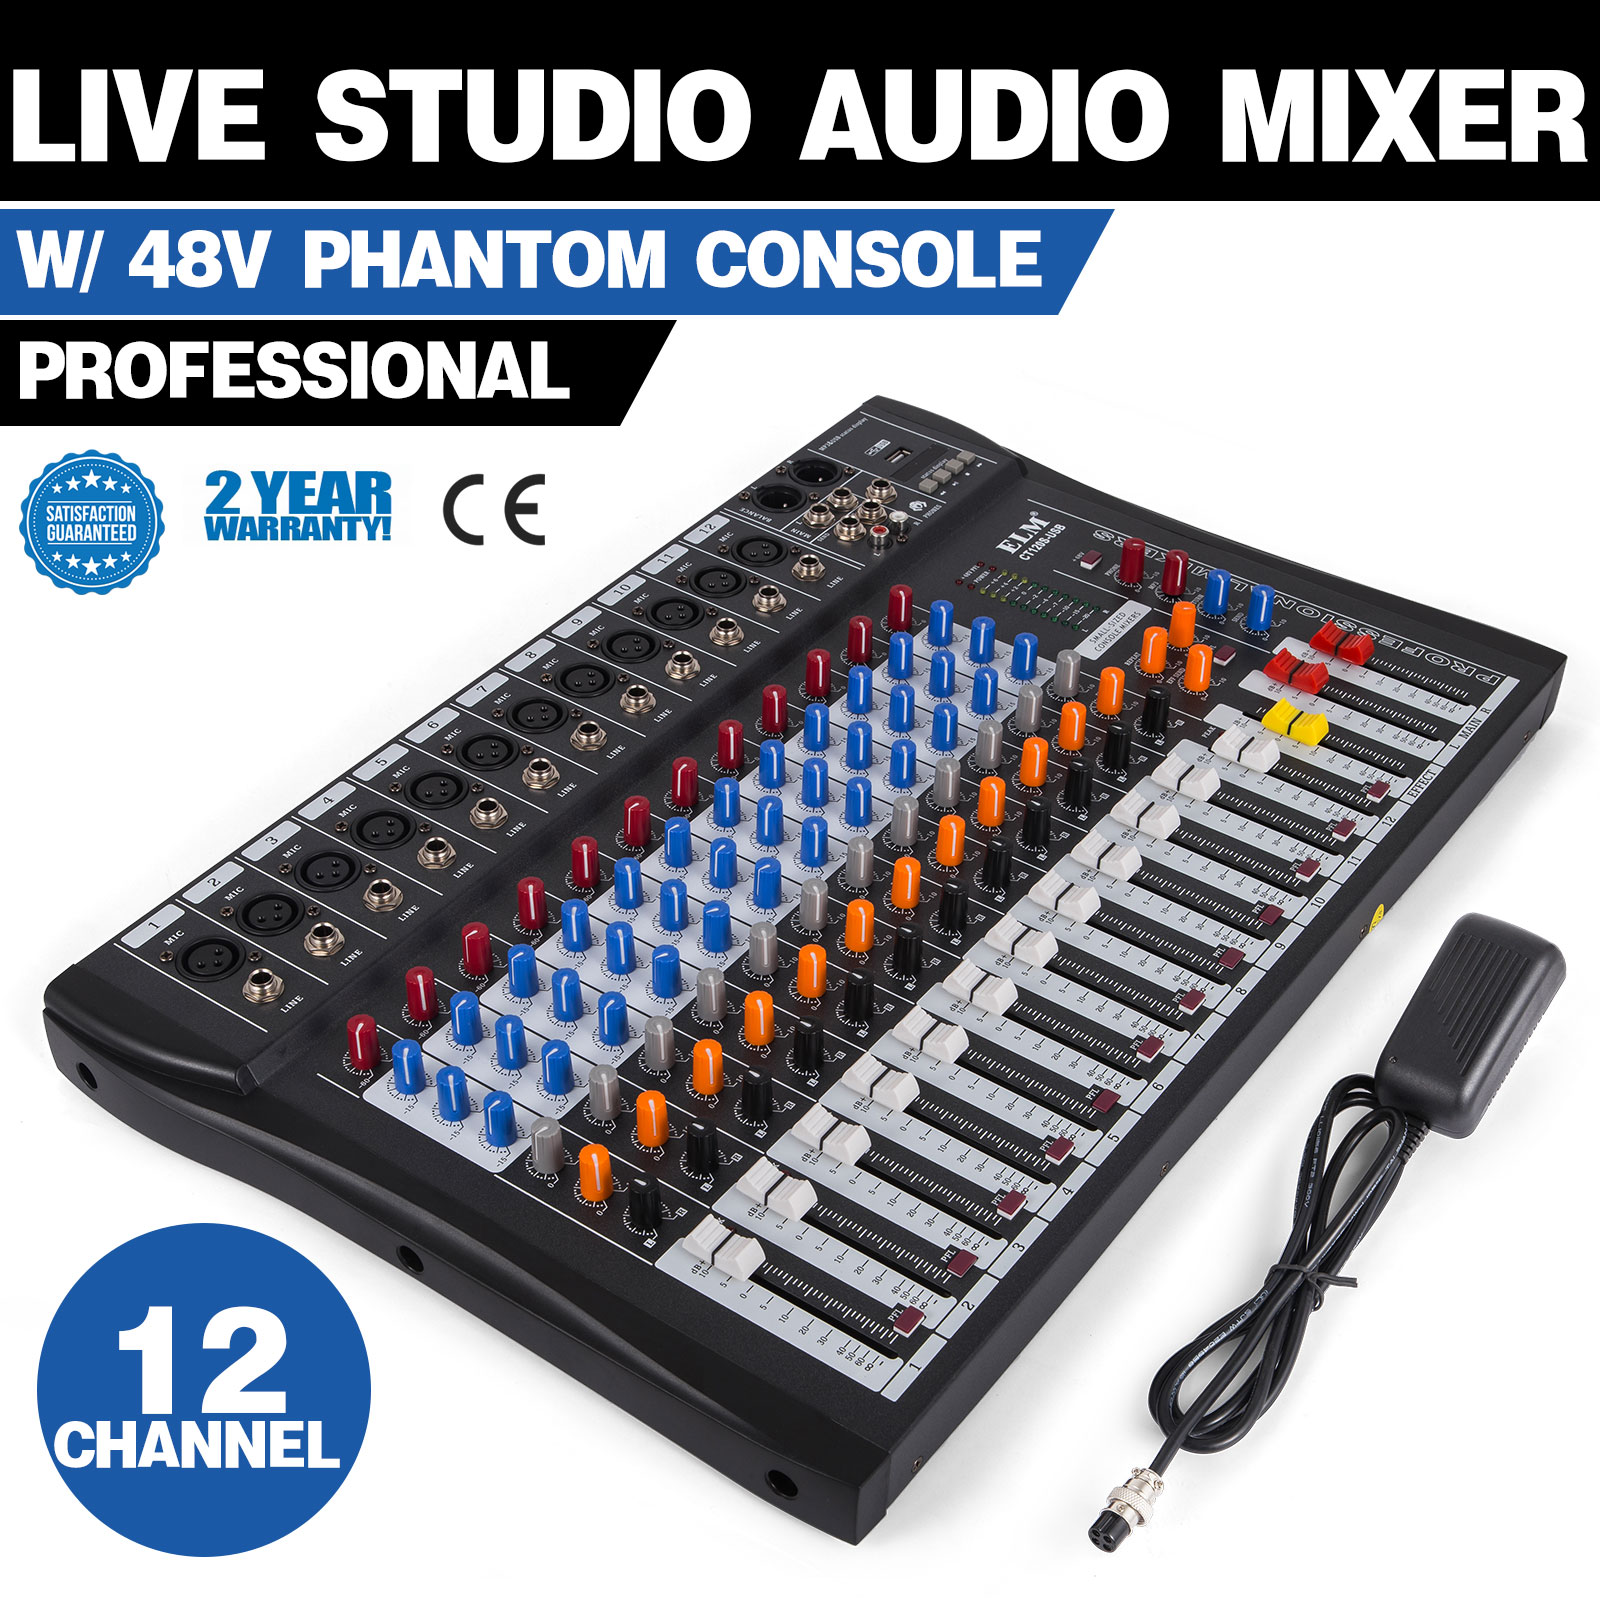 Details about 120S-USB 12 Channel Live Studio Audio Mixer Mixing Console  Phantom Power X7W8